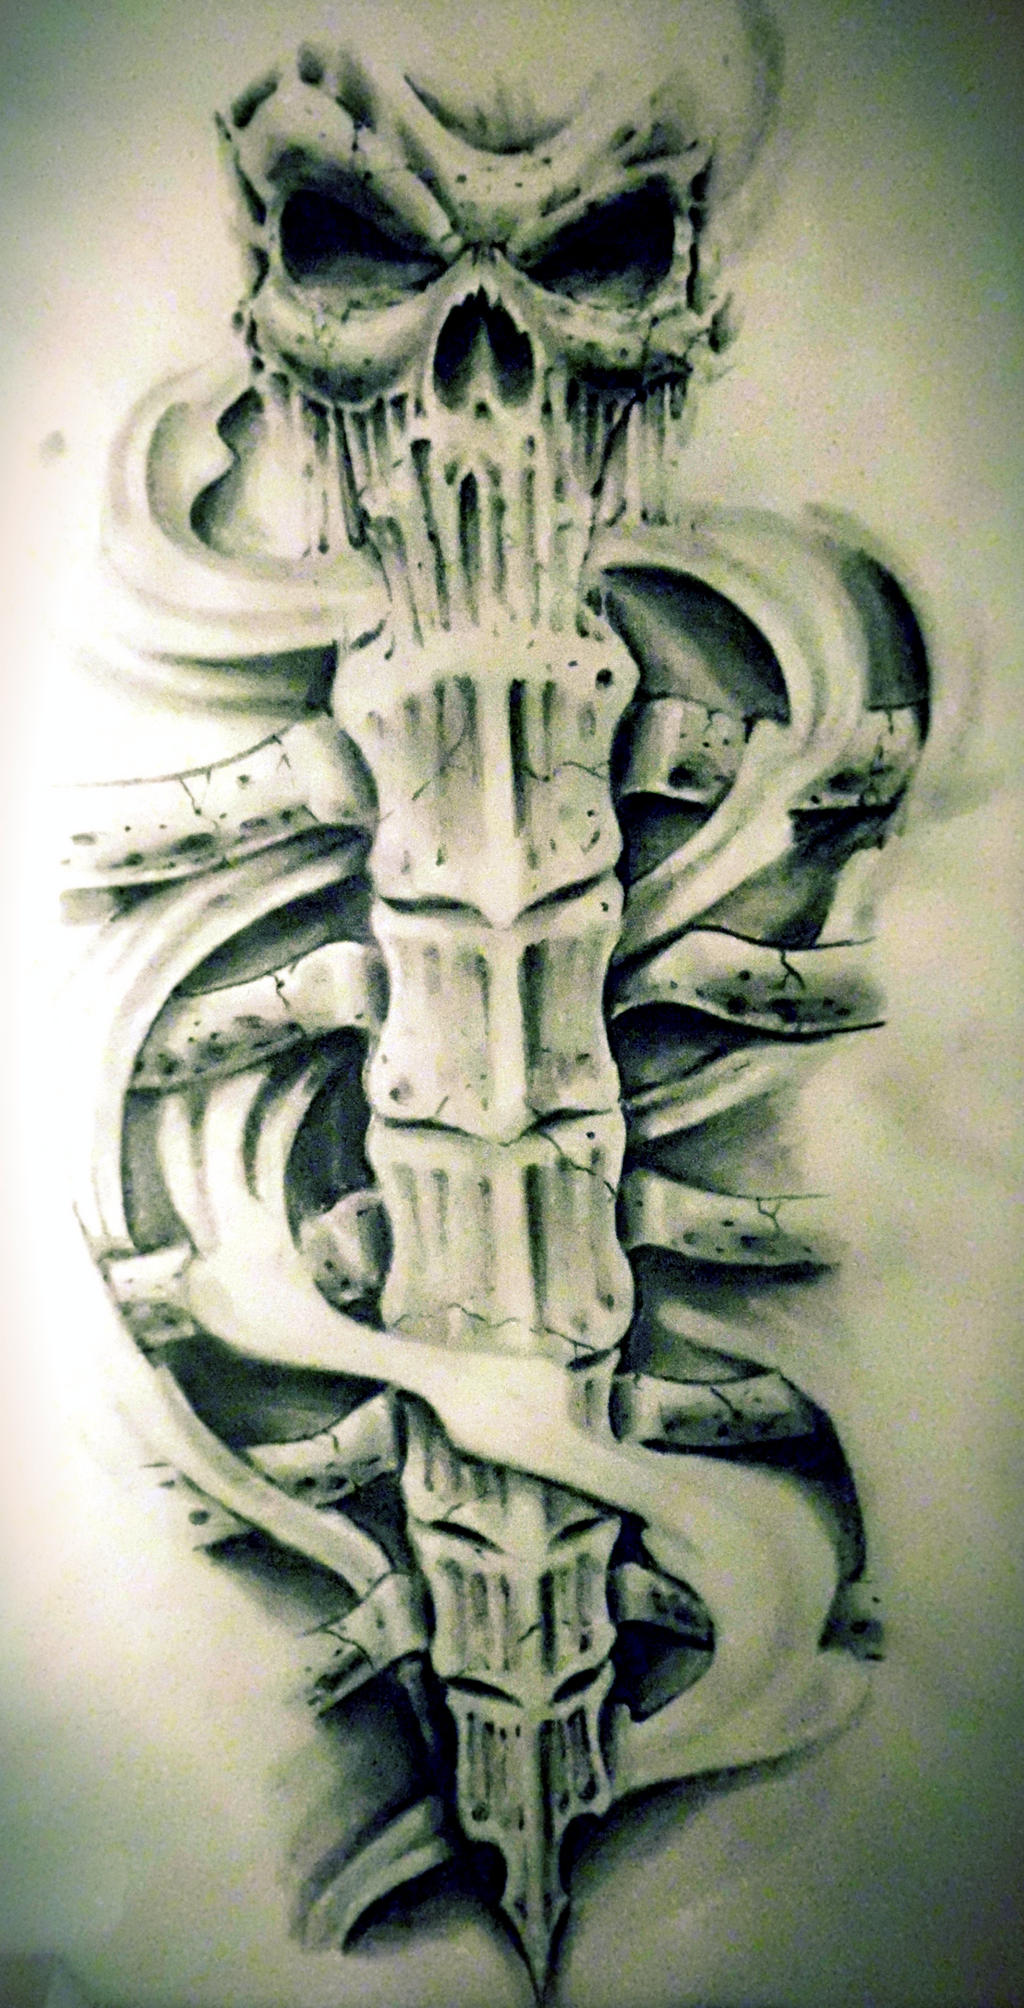 shin tattoo design by karlinoboy